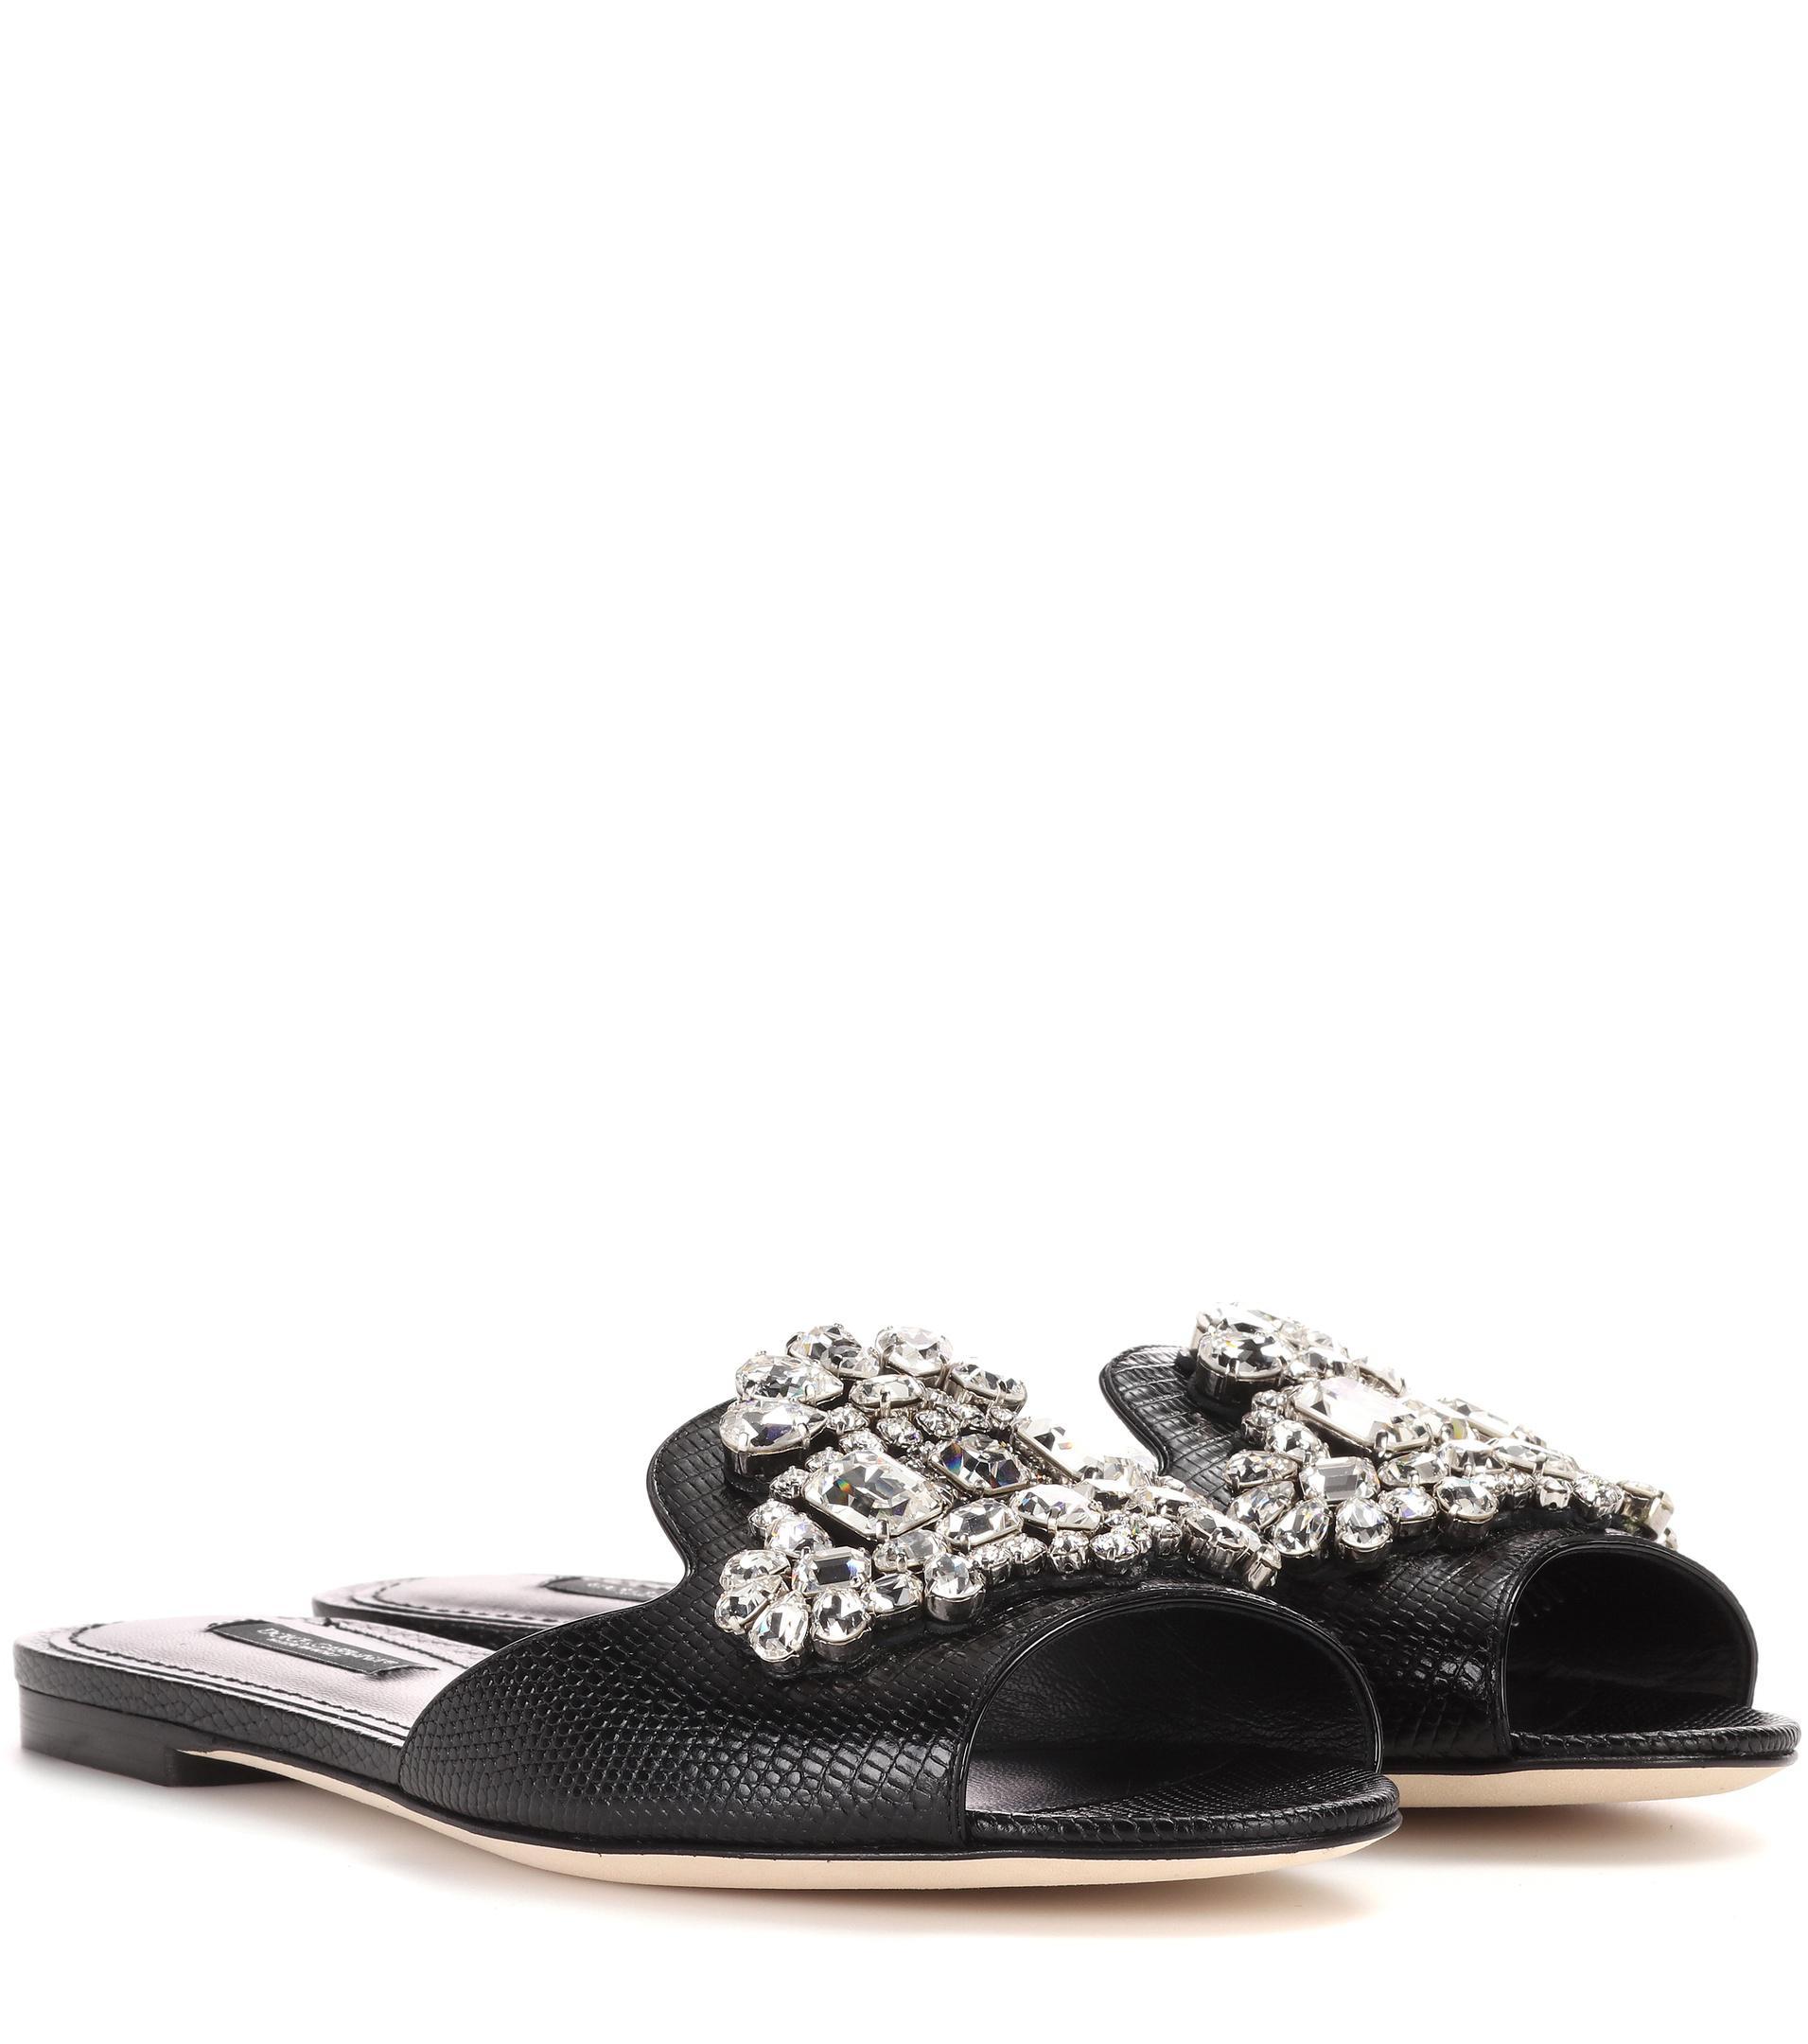 Dolce & Gabbana Embellished slides QqaAQ